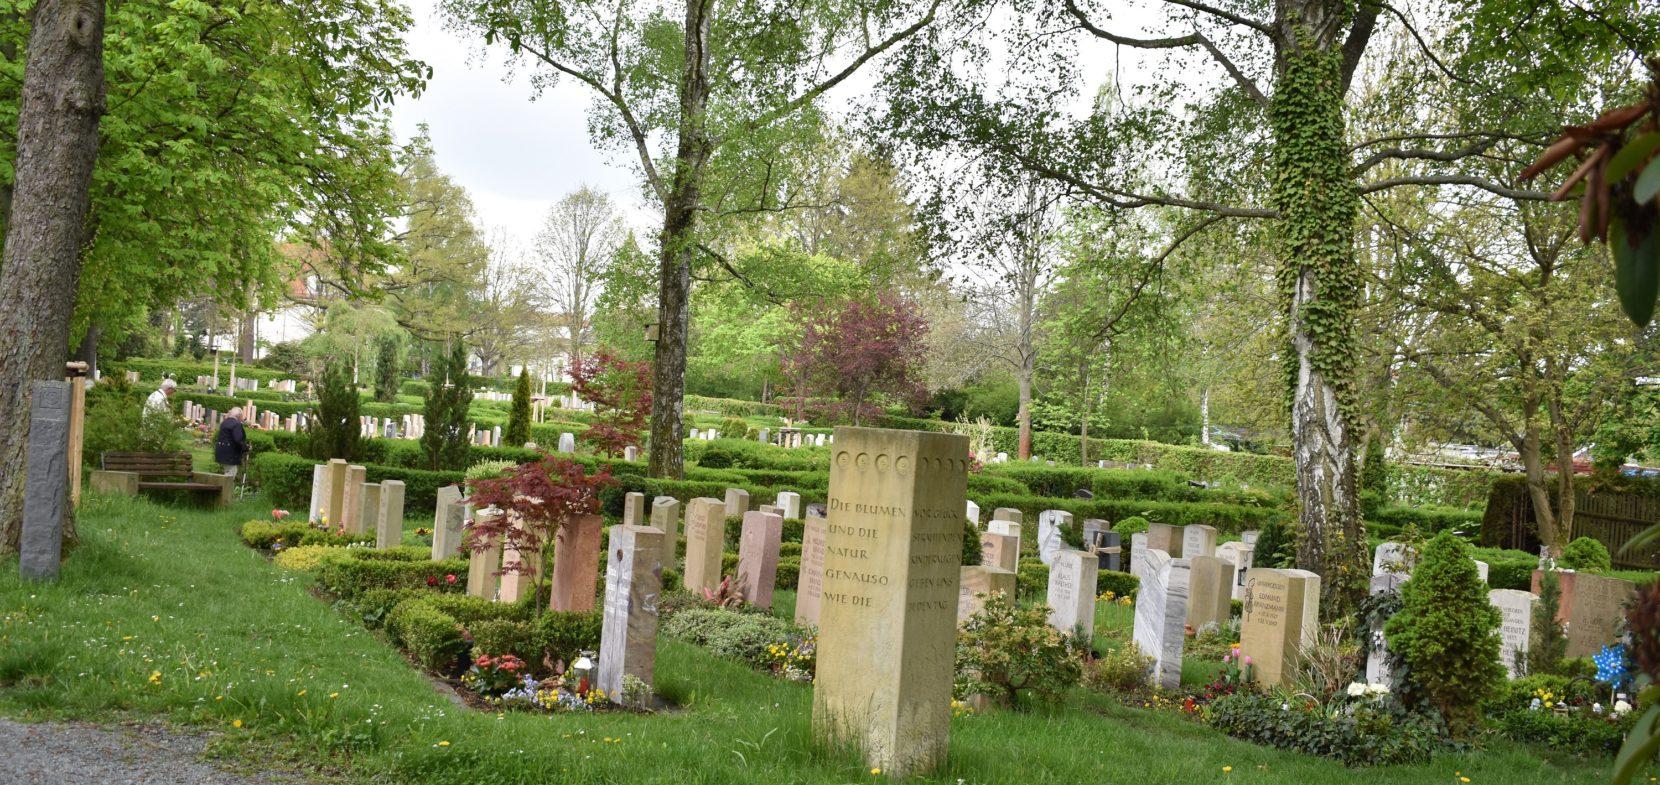 St. Andreas Friedhof